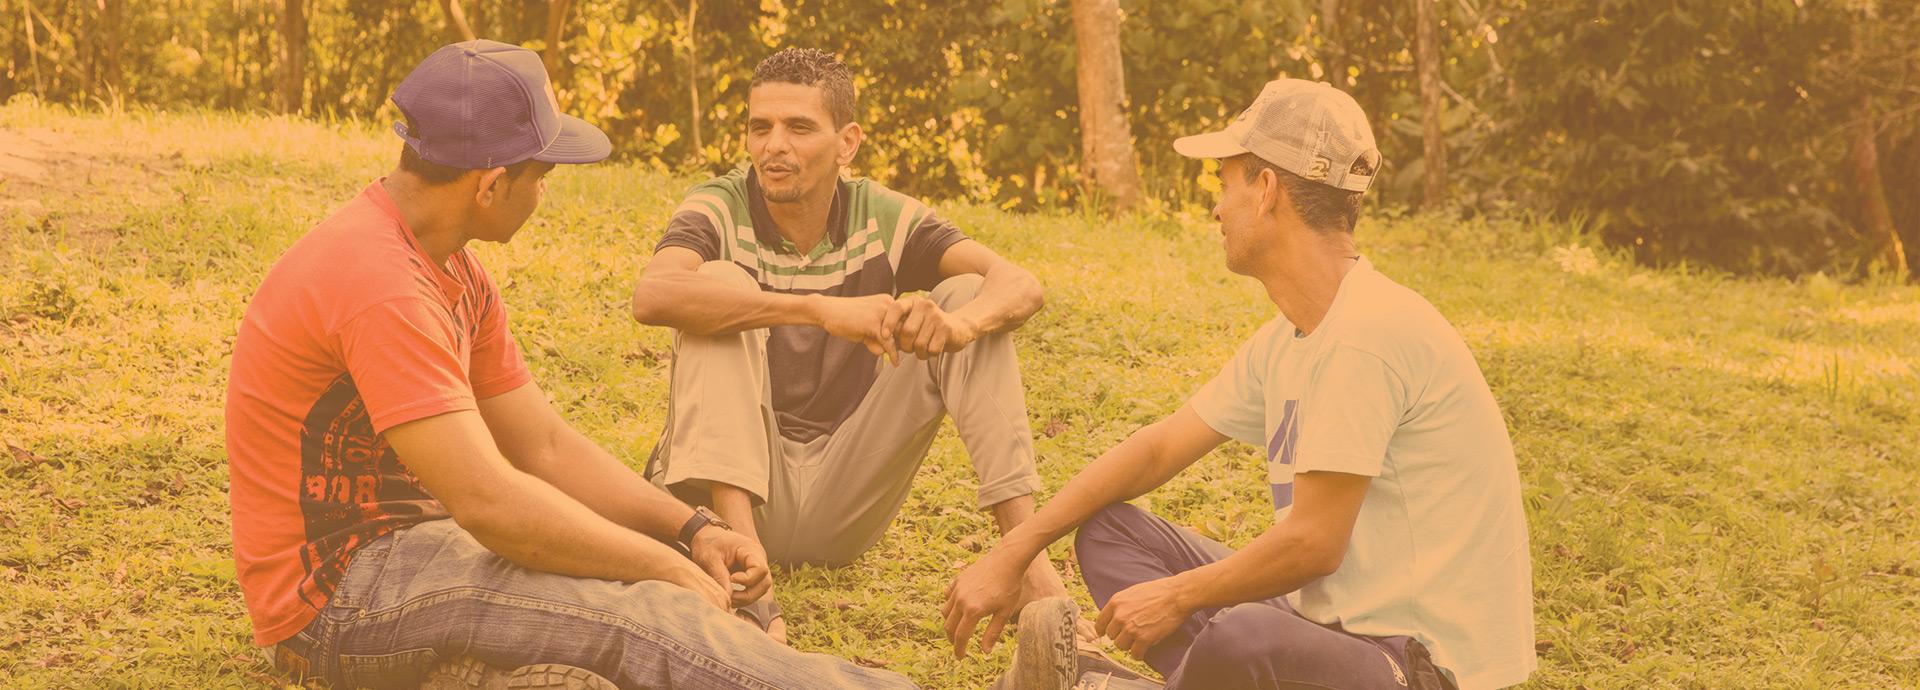 Nadi - Núcleo Assistencial de Desenvolvimento Integral